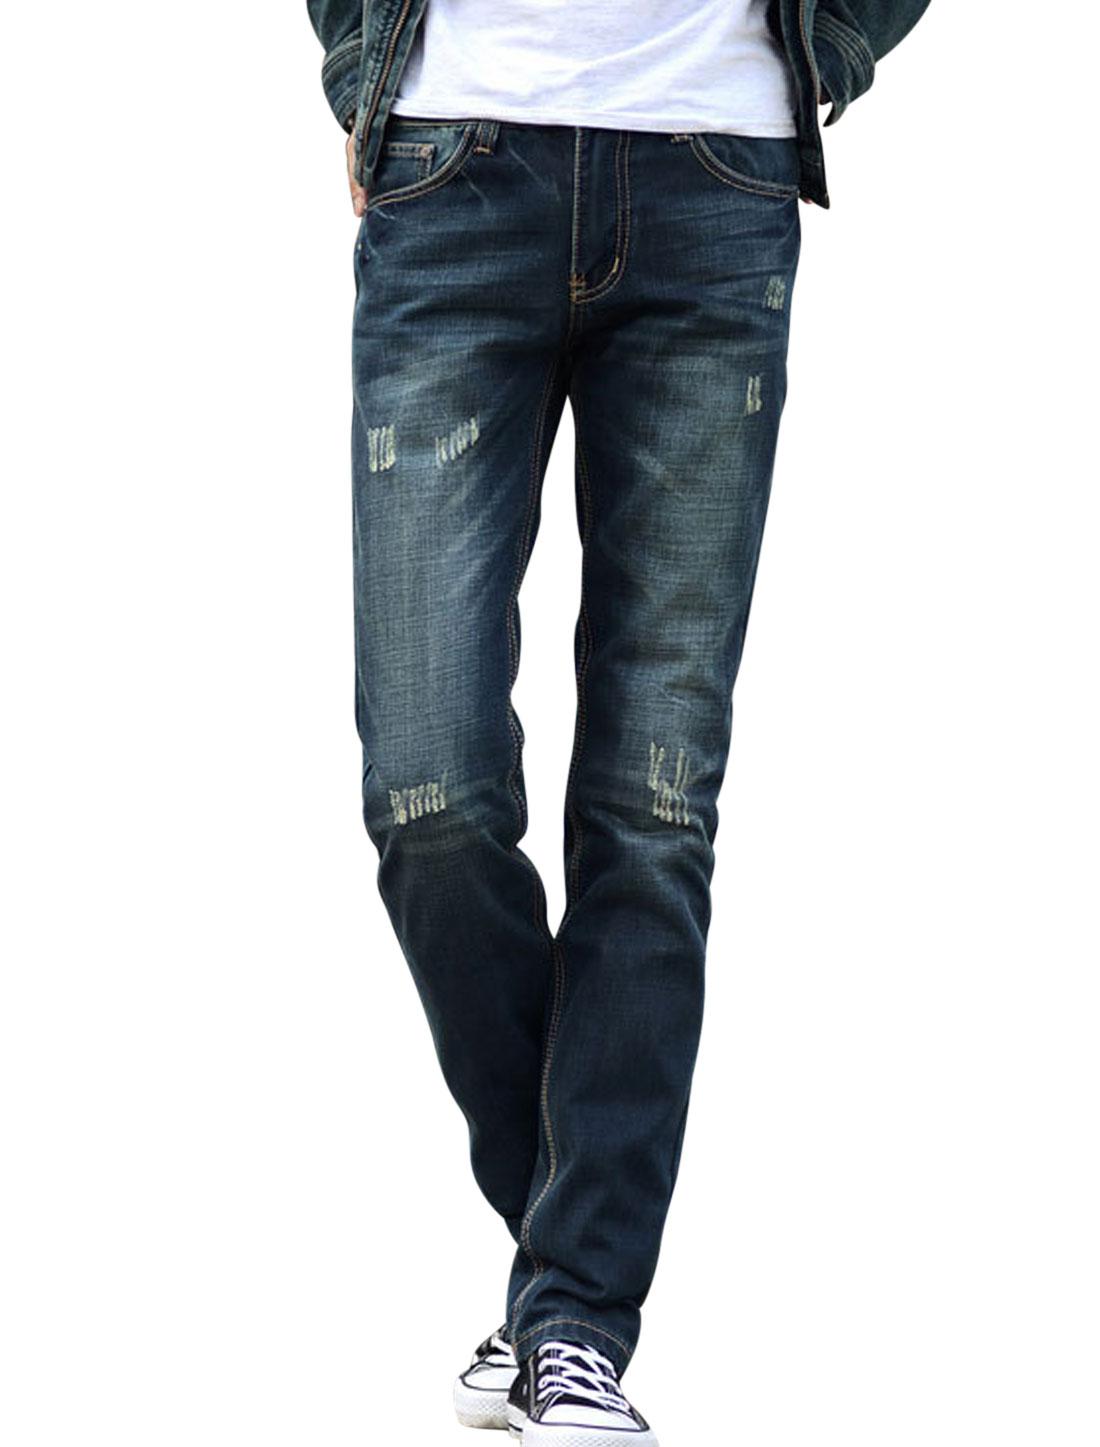 Men Mid Waist Destroied Design Two Back Pockets Denim Pants Navy Blue W34